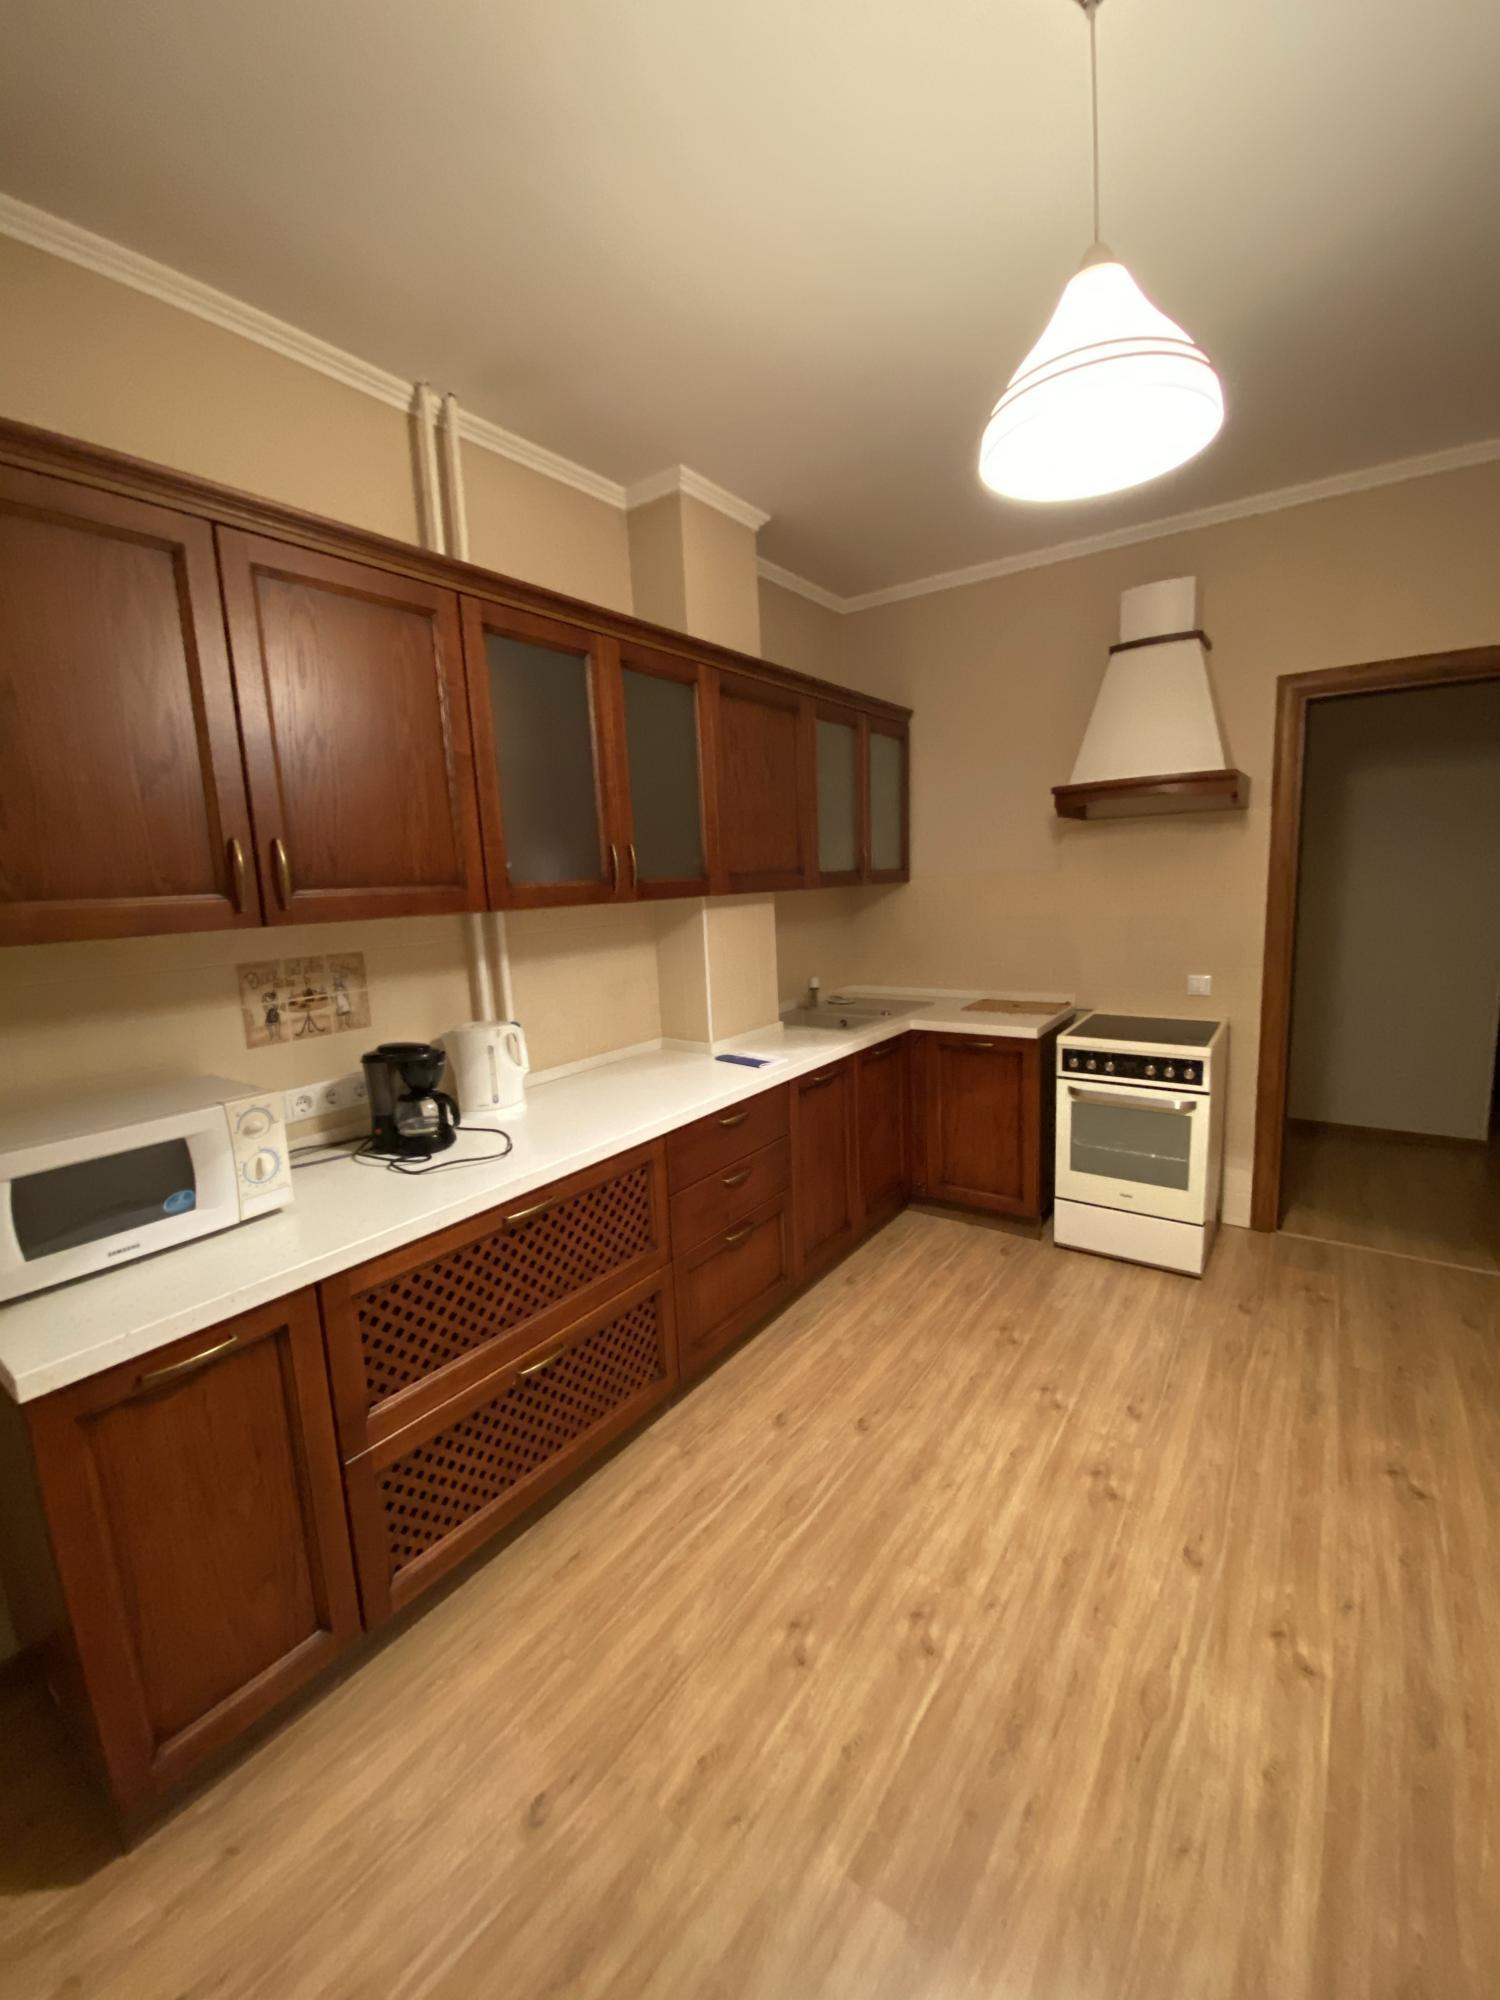 2к квартира Капитанская улица, 6 | 30000 | аренда в Красноярске фото 4